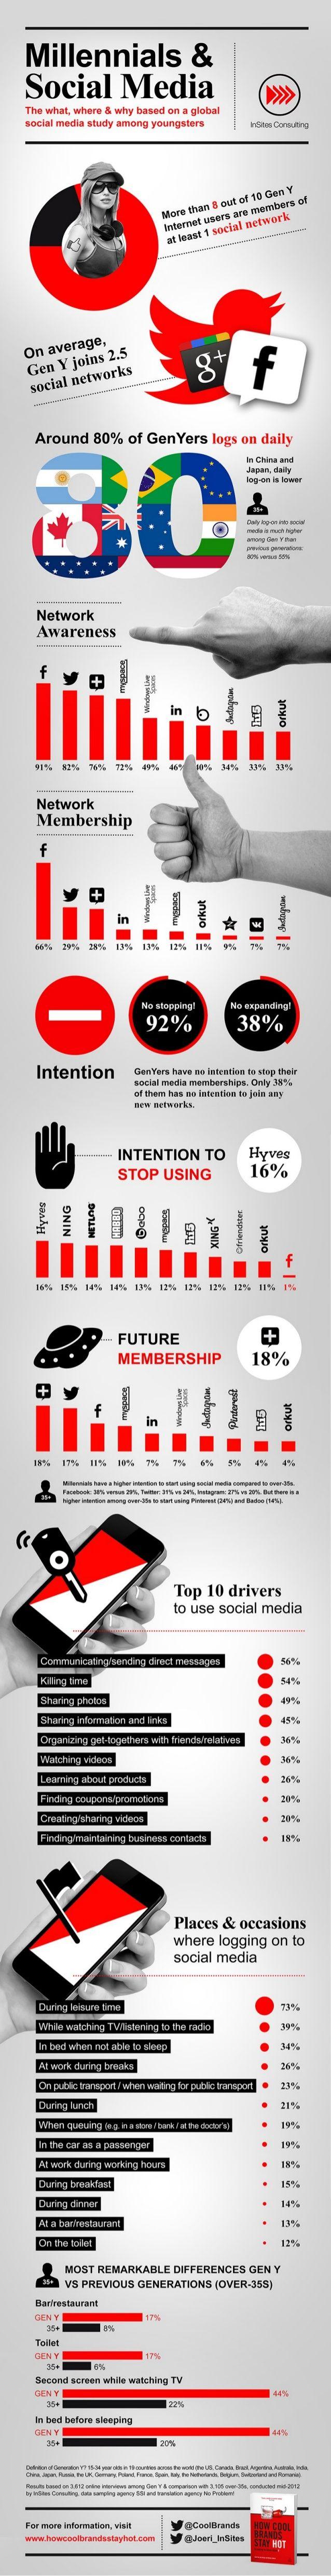 Infographic: Millennials & Social Media  http://www.insites-consulting.com/infographic-millennials-social-media/